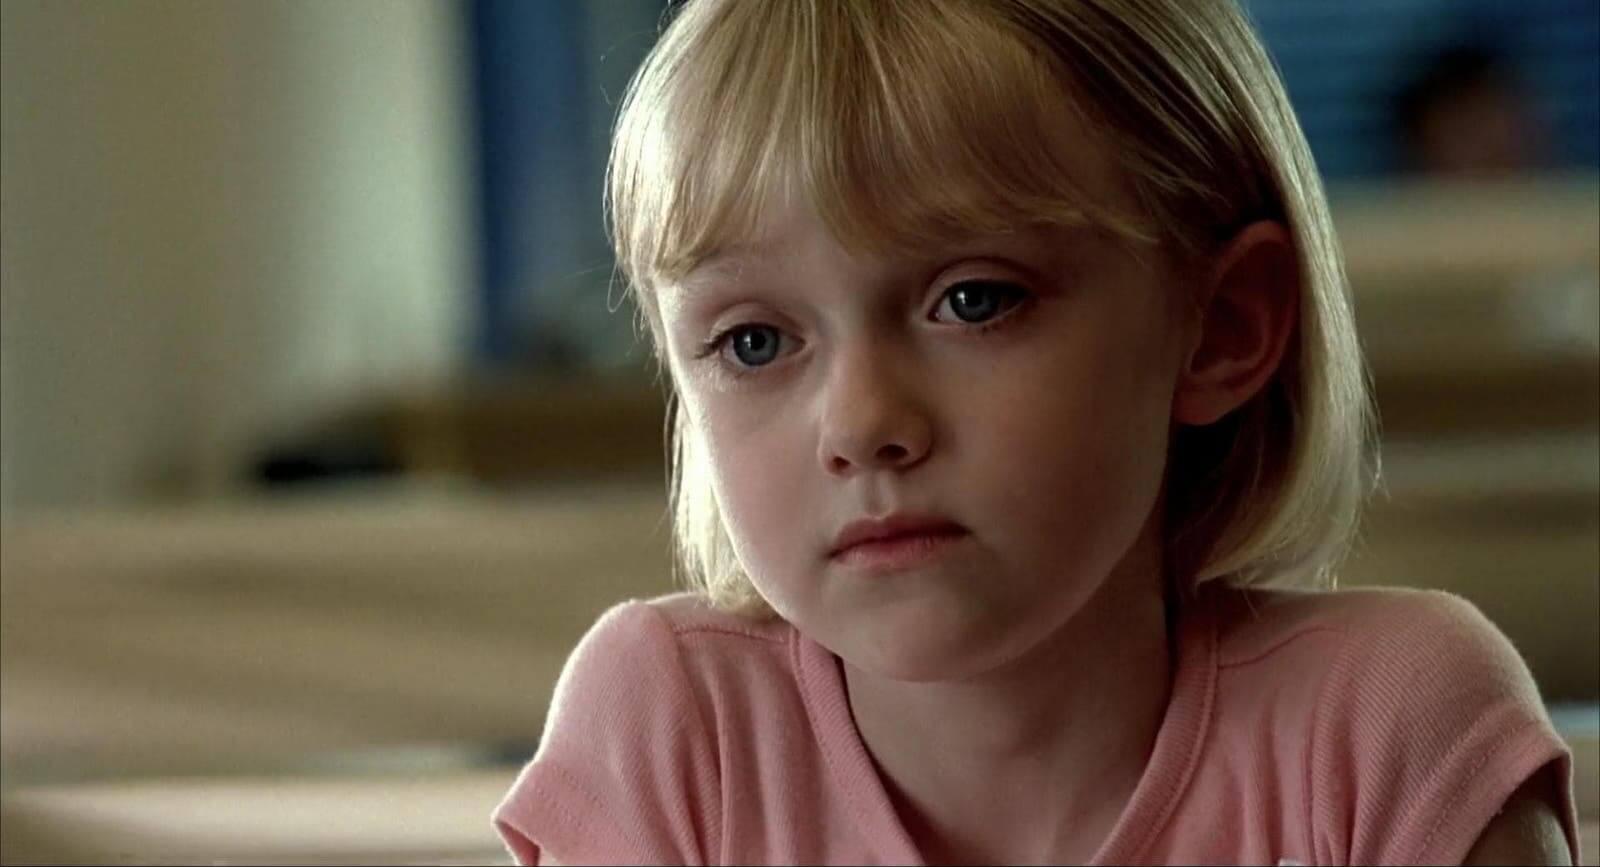 Child Labor Laws - Child Actors - Child Stars - Dakota Fanning - Studiobinder